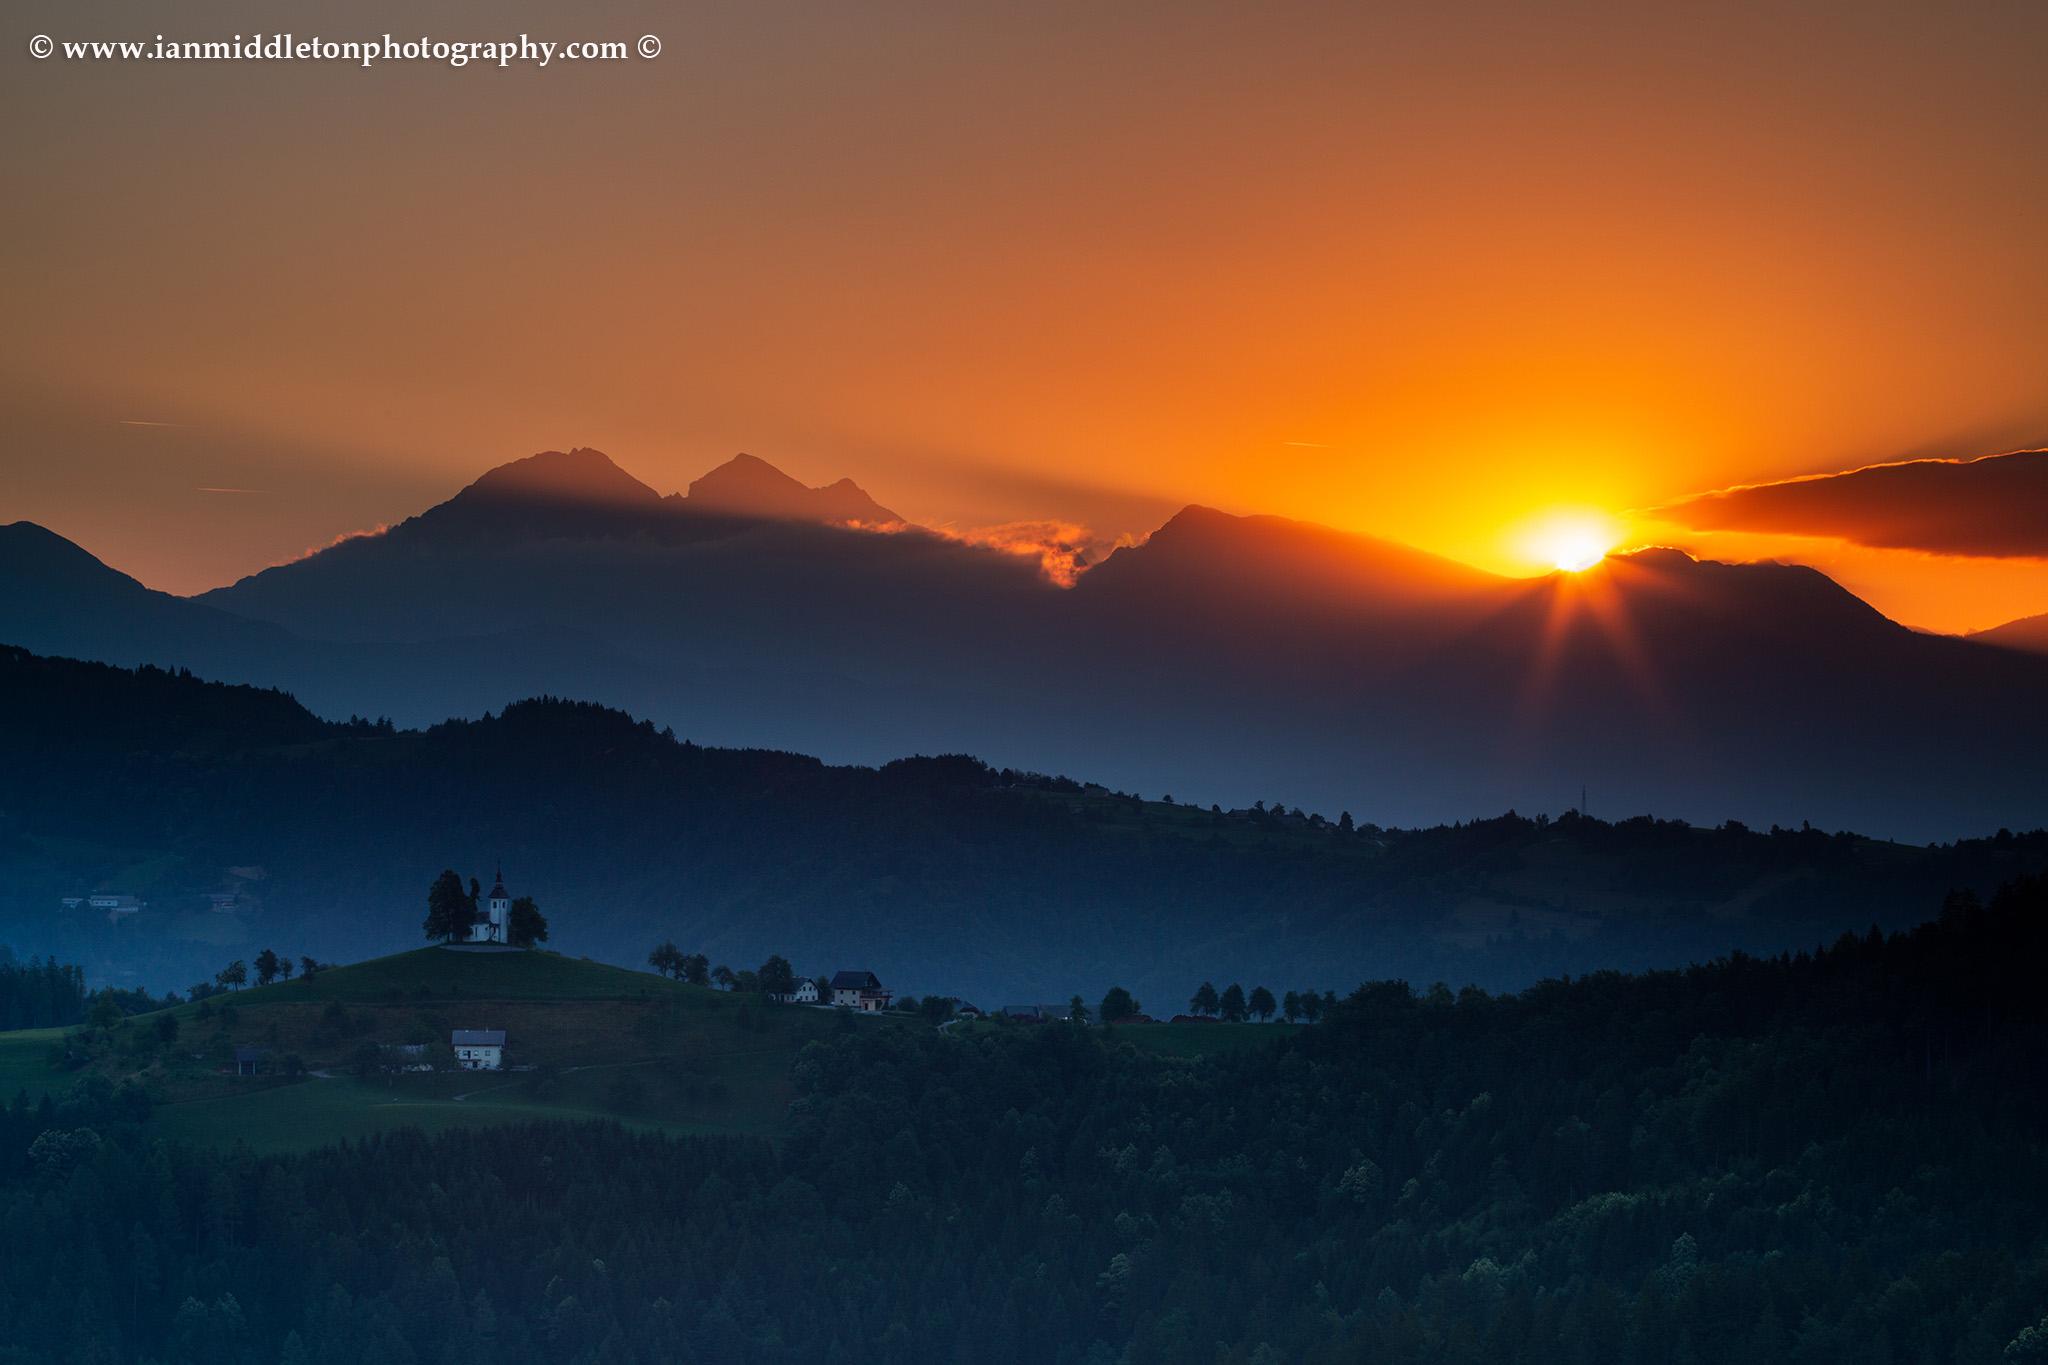 View at sunrise from Rantovše hill across to Sveti Tomaz nad Praprotnim (church of Saint Thomas) and the Kamnik Alps, Slovenia.